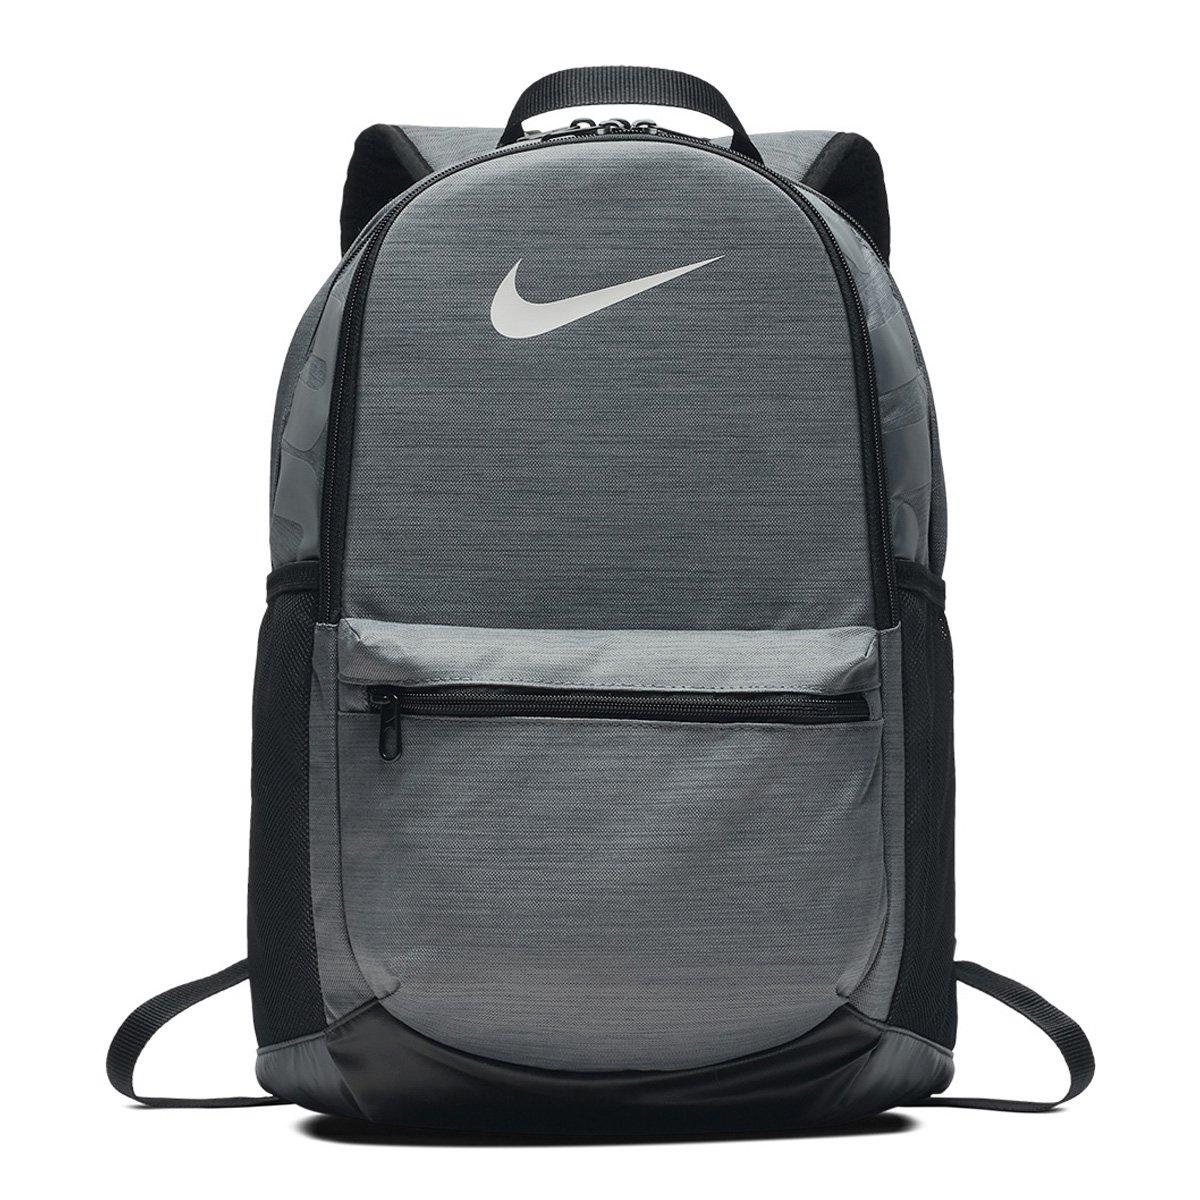 Mochila Nike Brasília - Cinza e Preto - Compre Agora  7ab526265af62